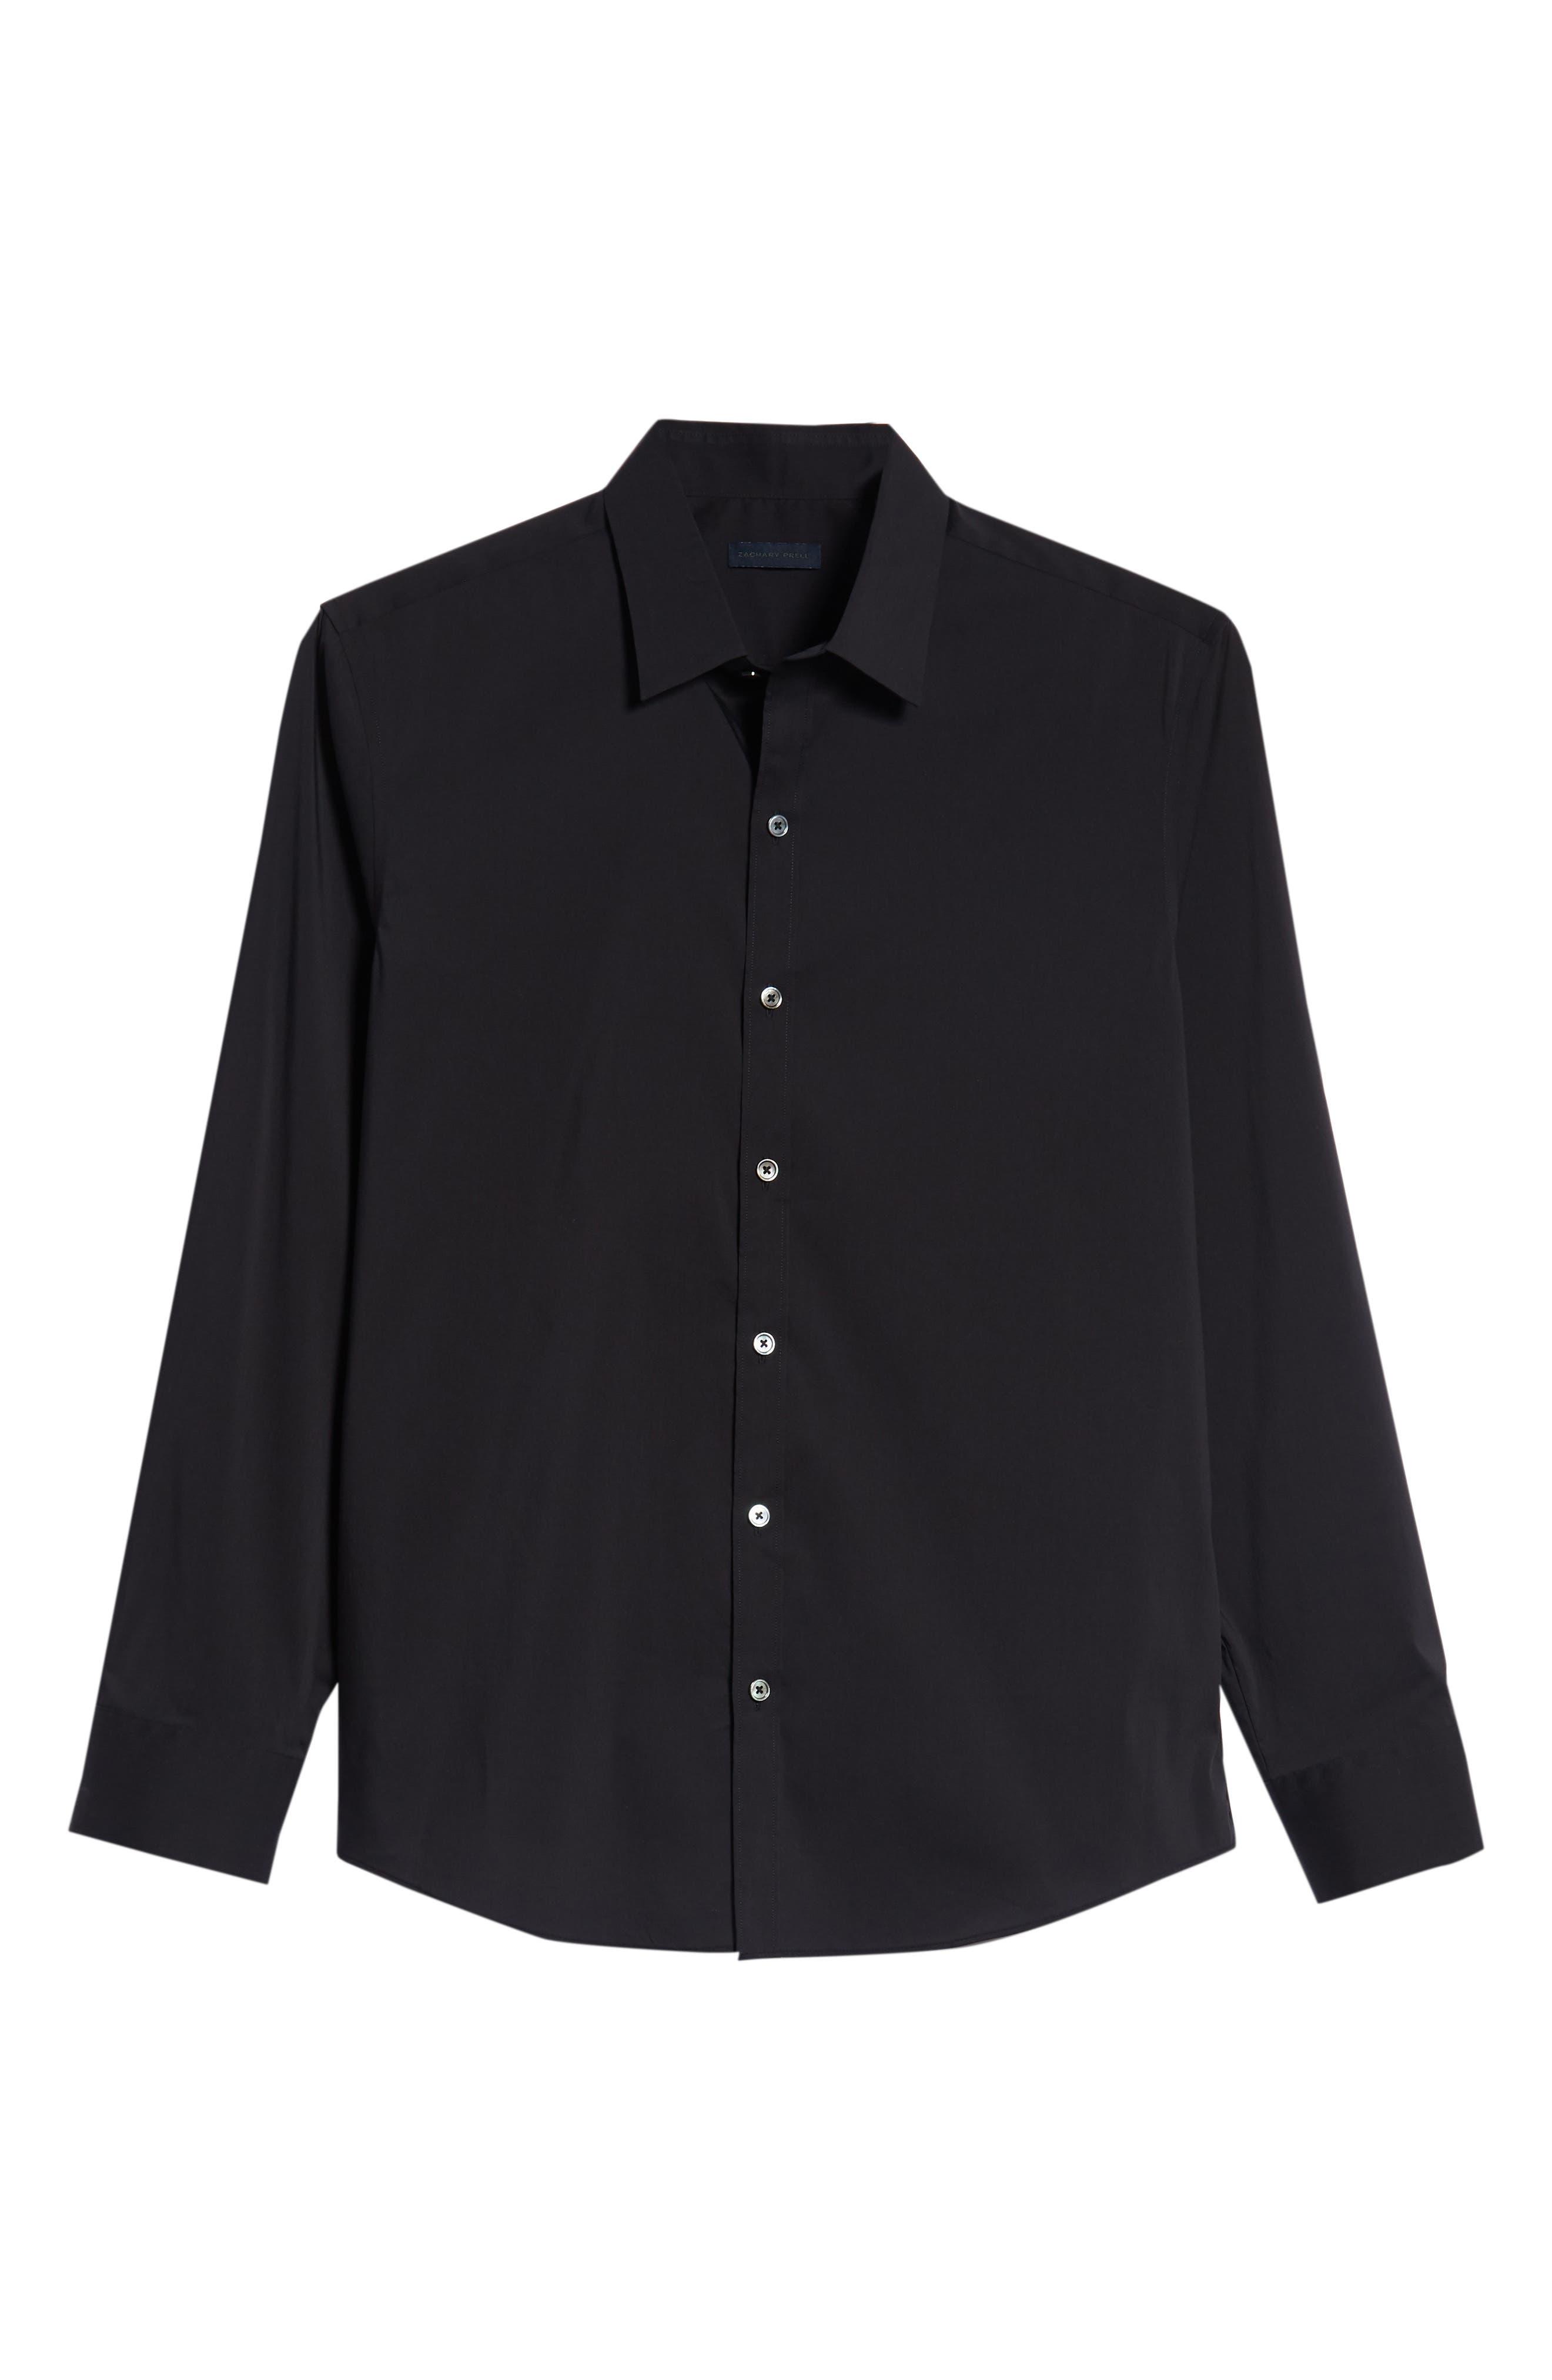 Mulberry Regular Fit Sport Shirt,                             Alternate thumbnail 5, color,                             BLACK